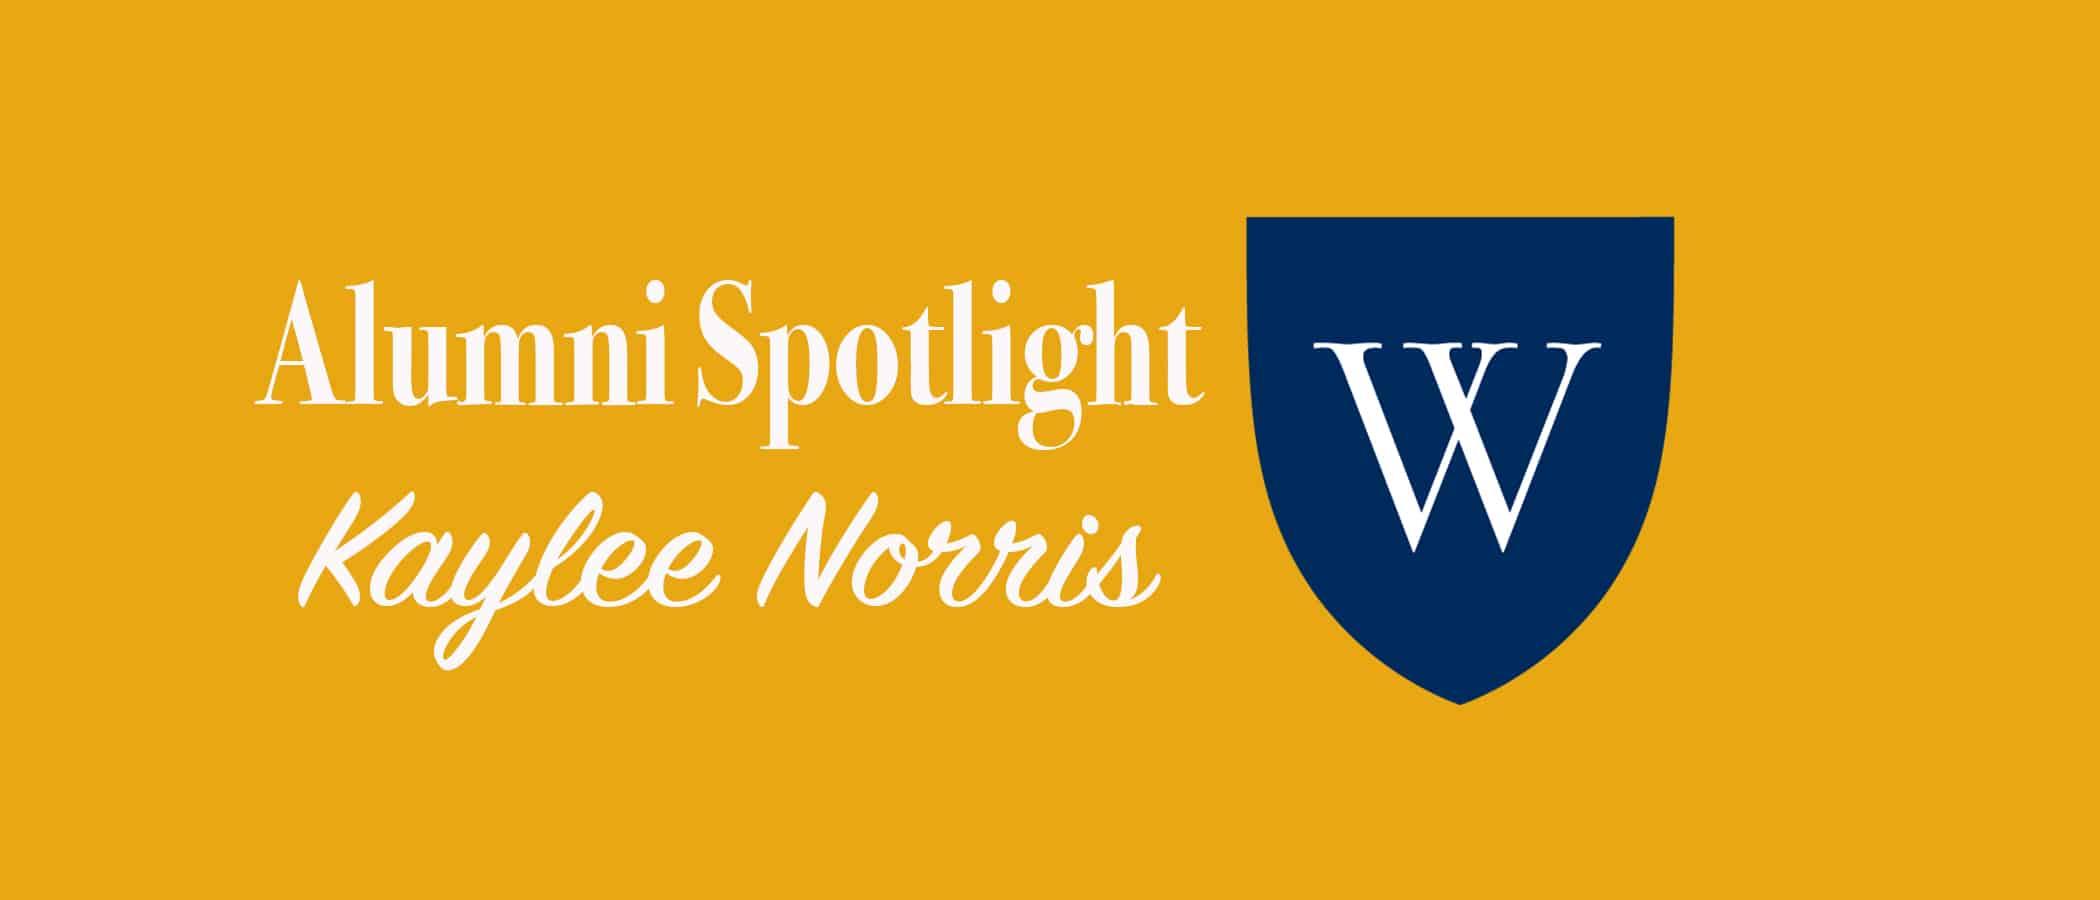 Alumni Spotlight: Kaylee Norris BA'16